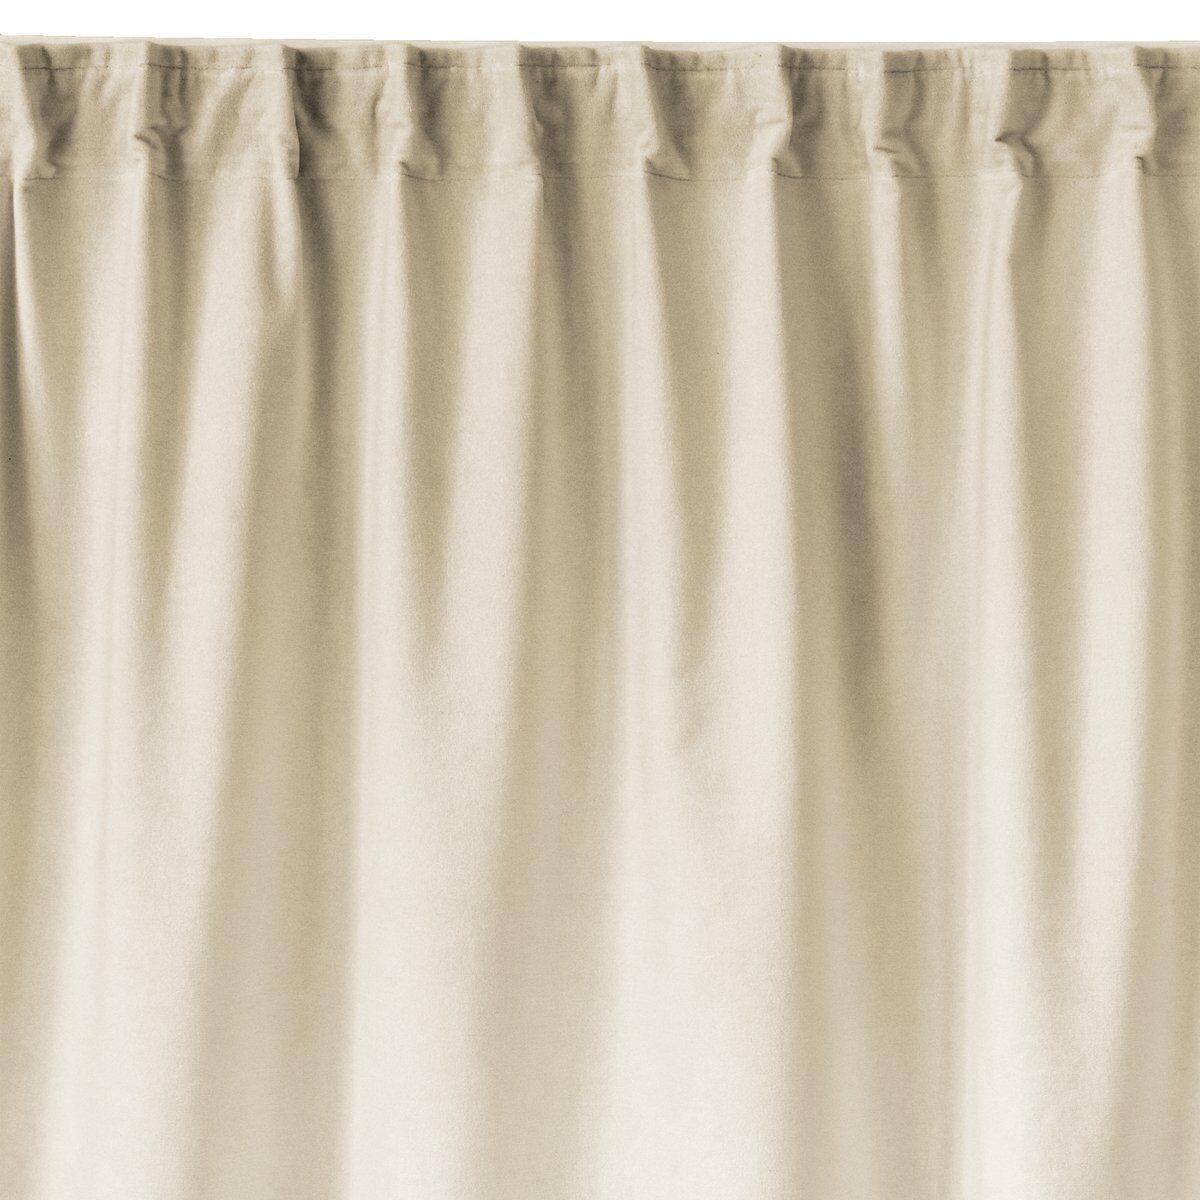 Linum Paolo gardin med rynkebånd Gräddig beige